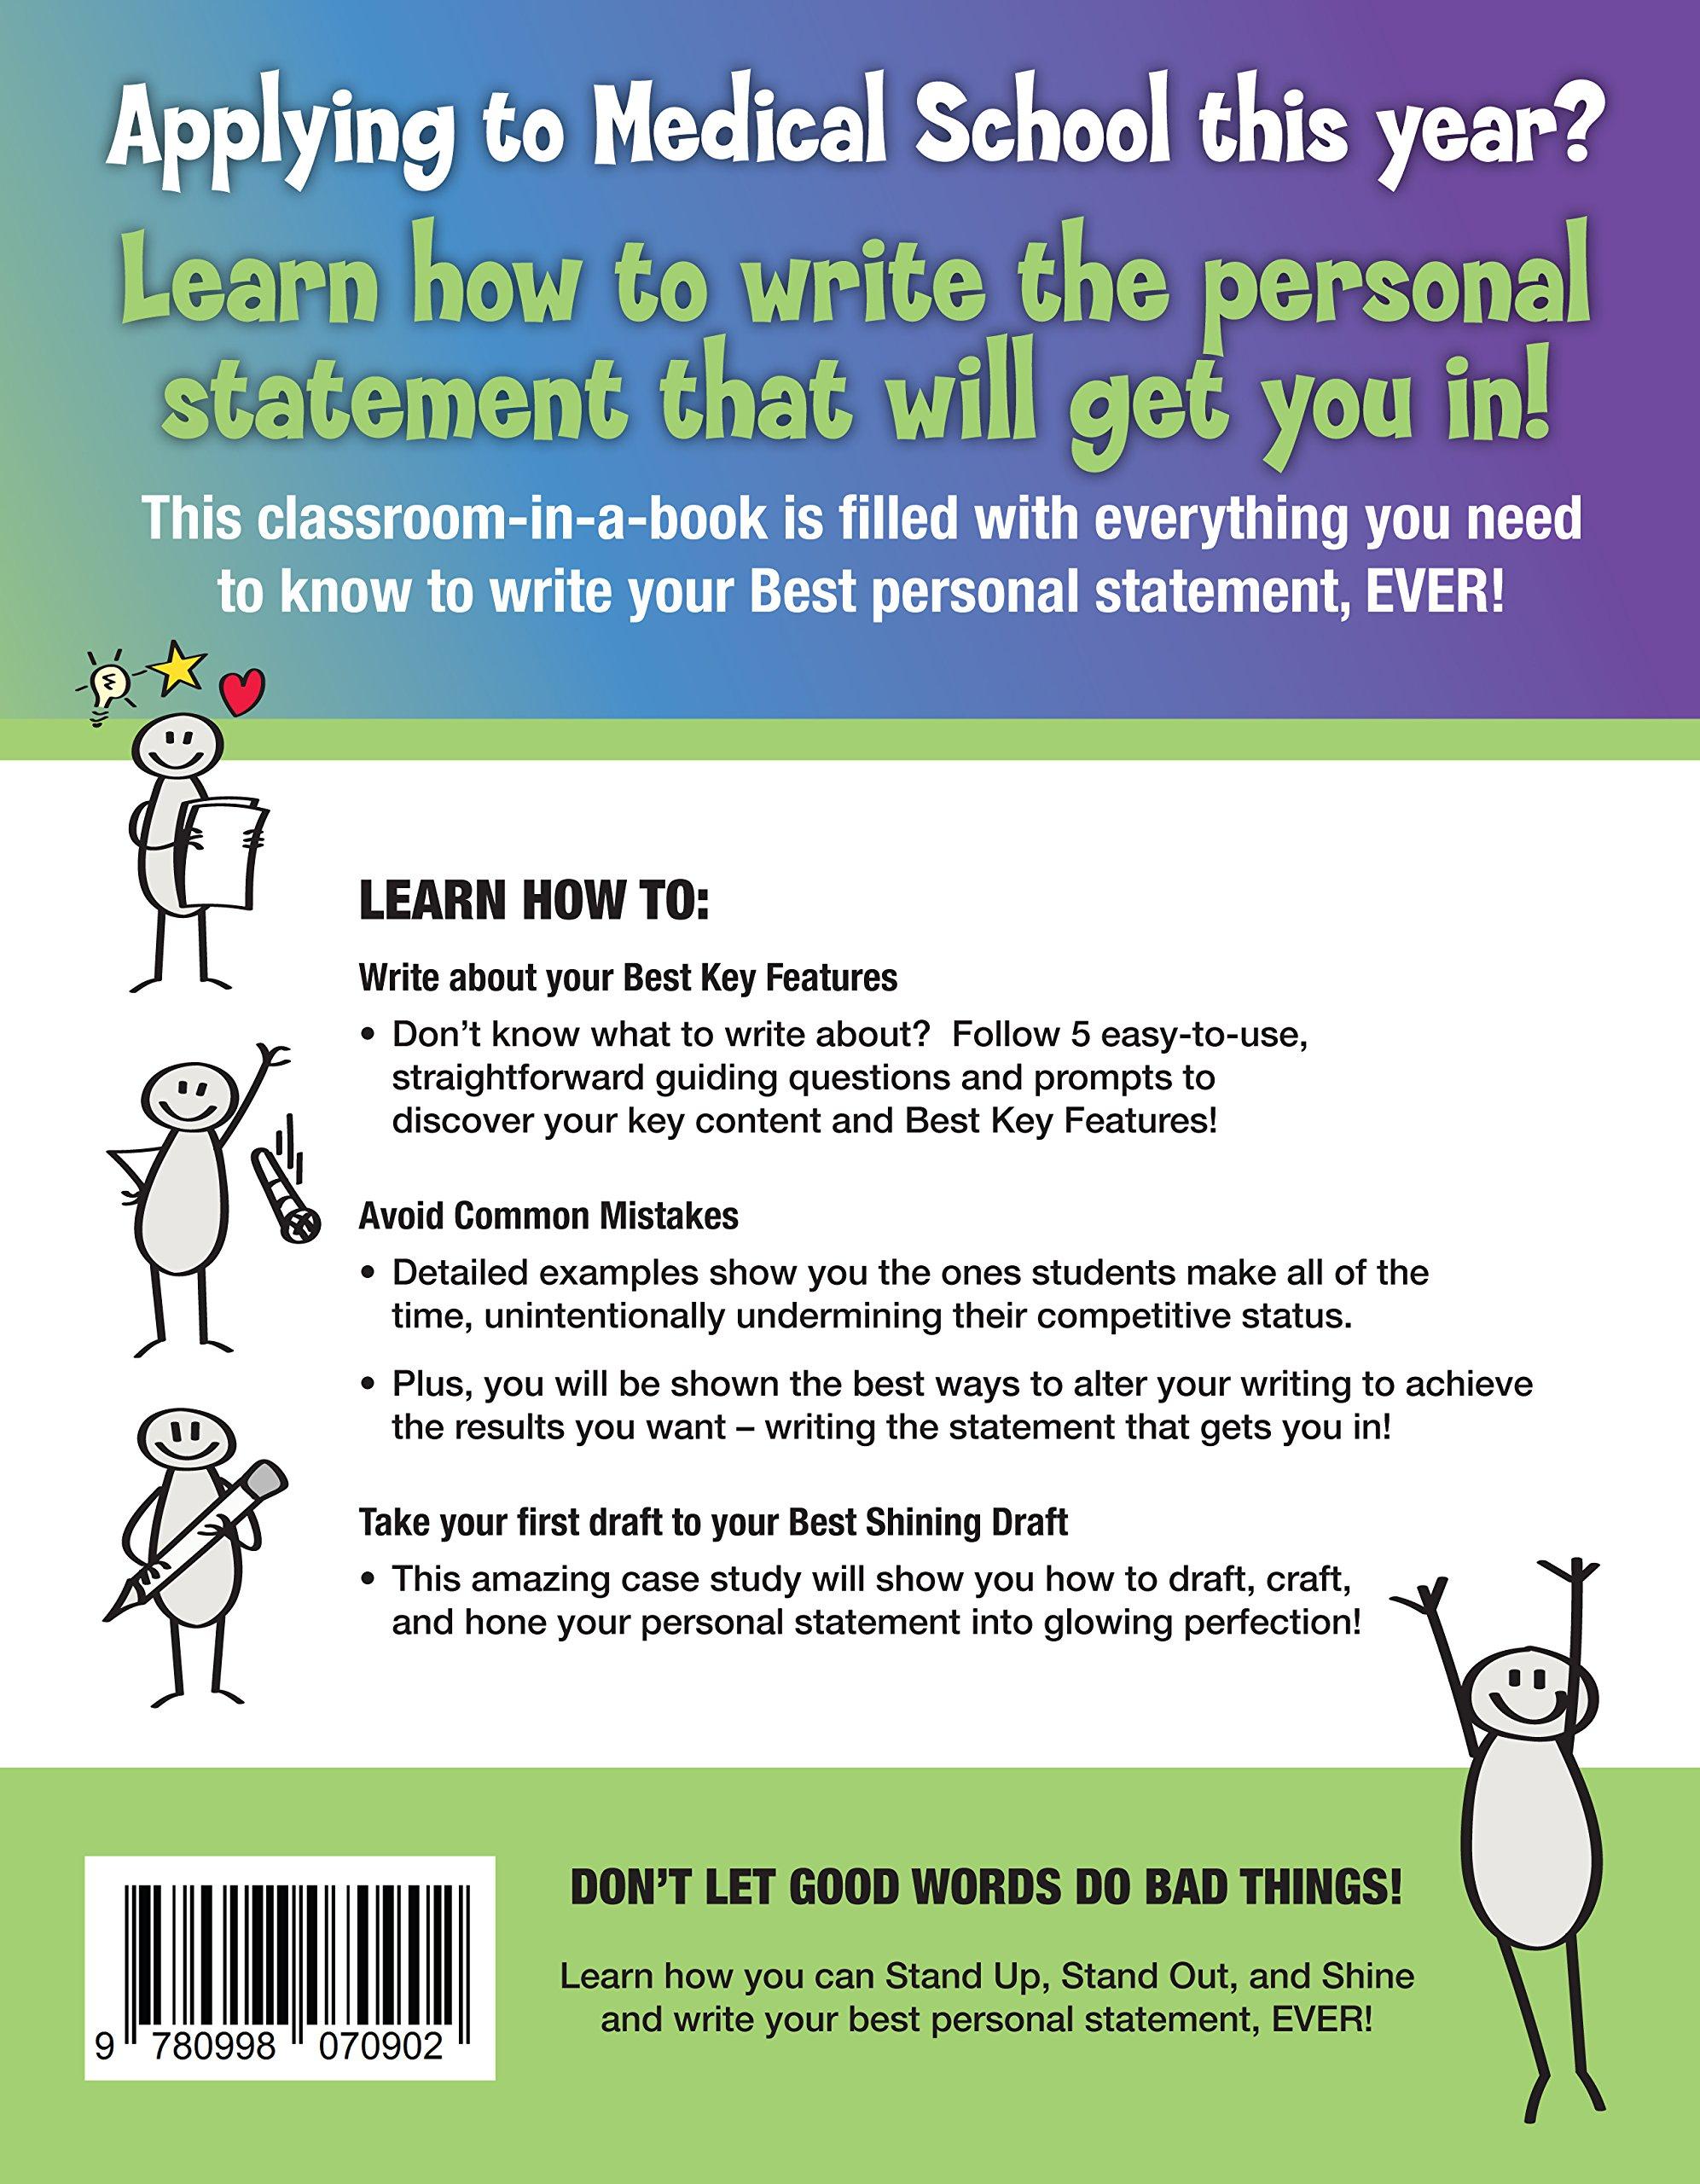 Professional essay writing service medical school